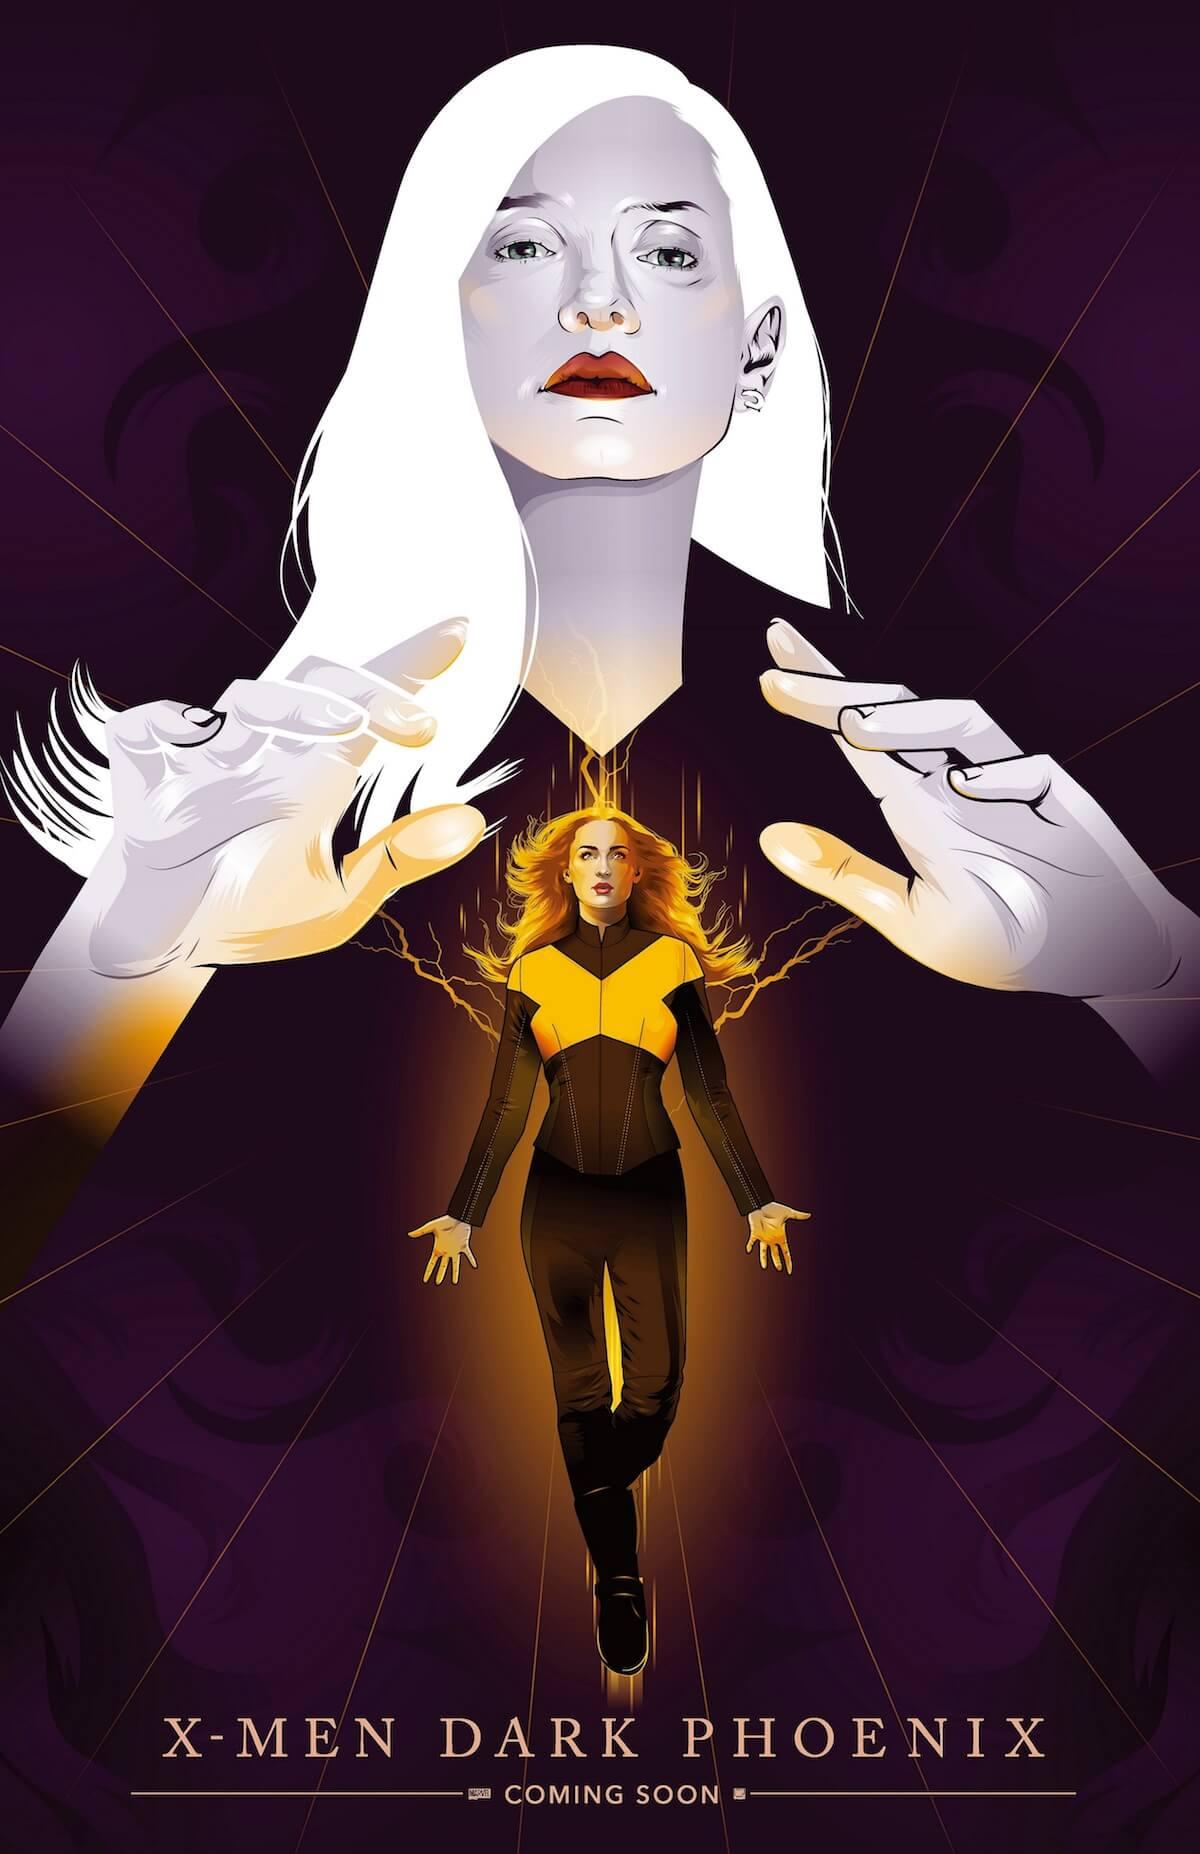 『X-MEN:ダーク・フェニックス』公開記念イベント<XーMEN DAY>が開催!ジーン役ソフィー・ターナーの特別映像解禁 film190517_xmenday_4